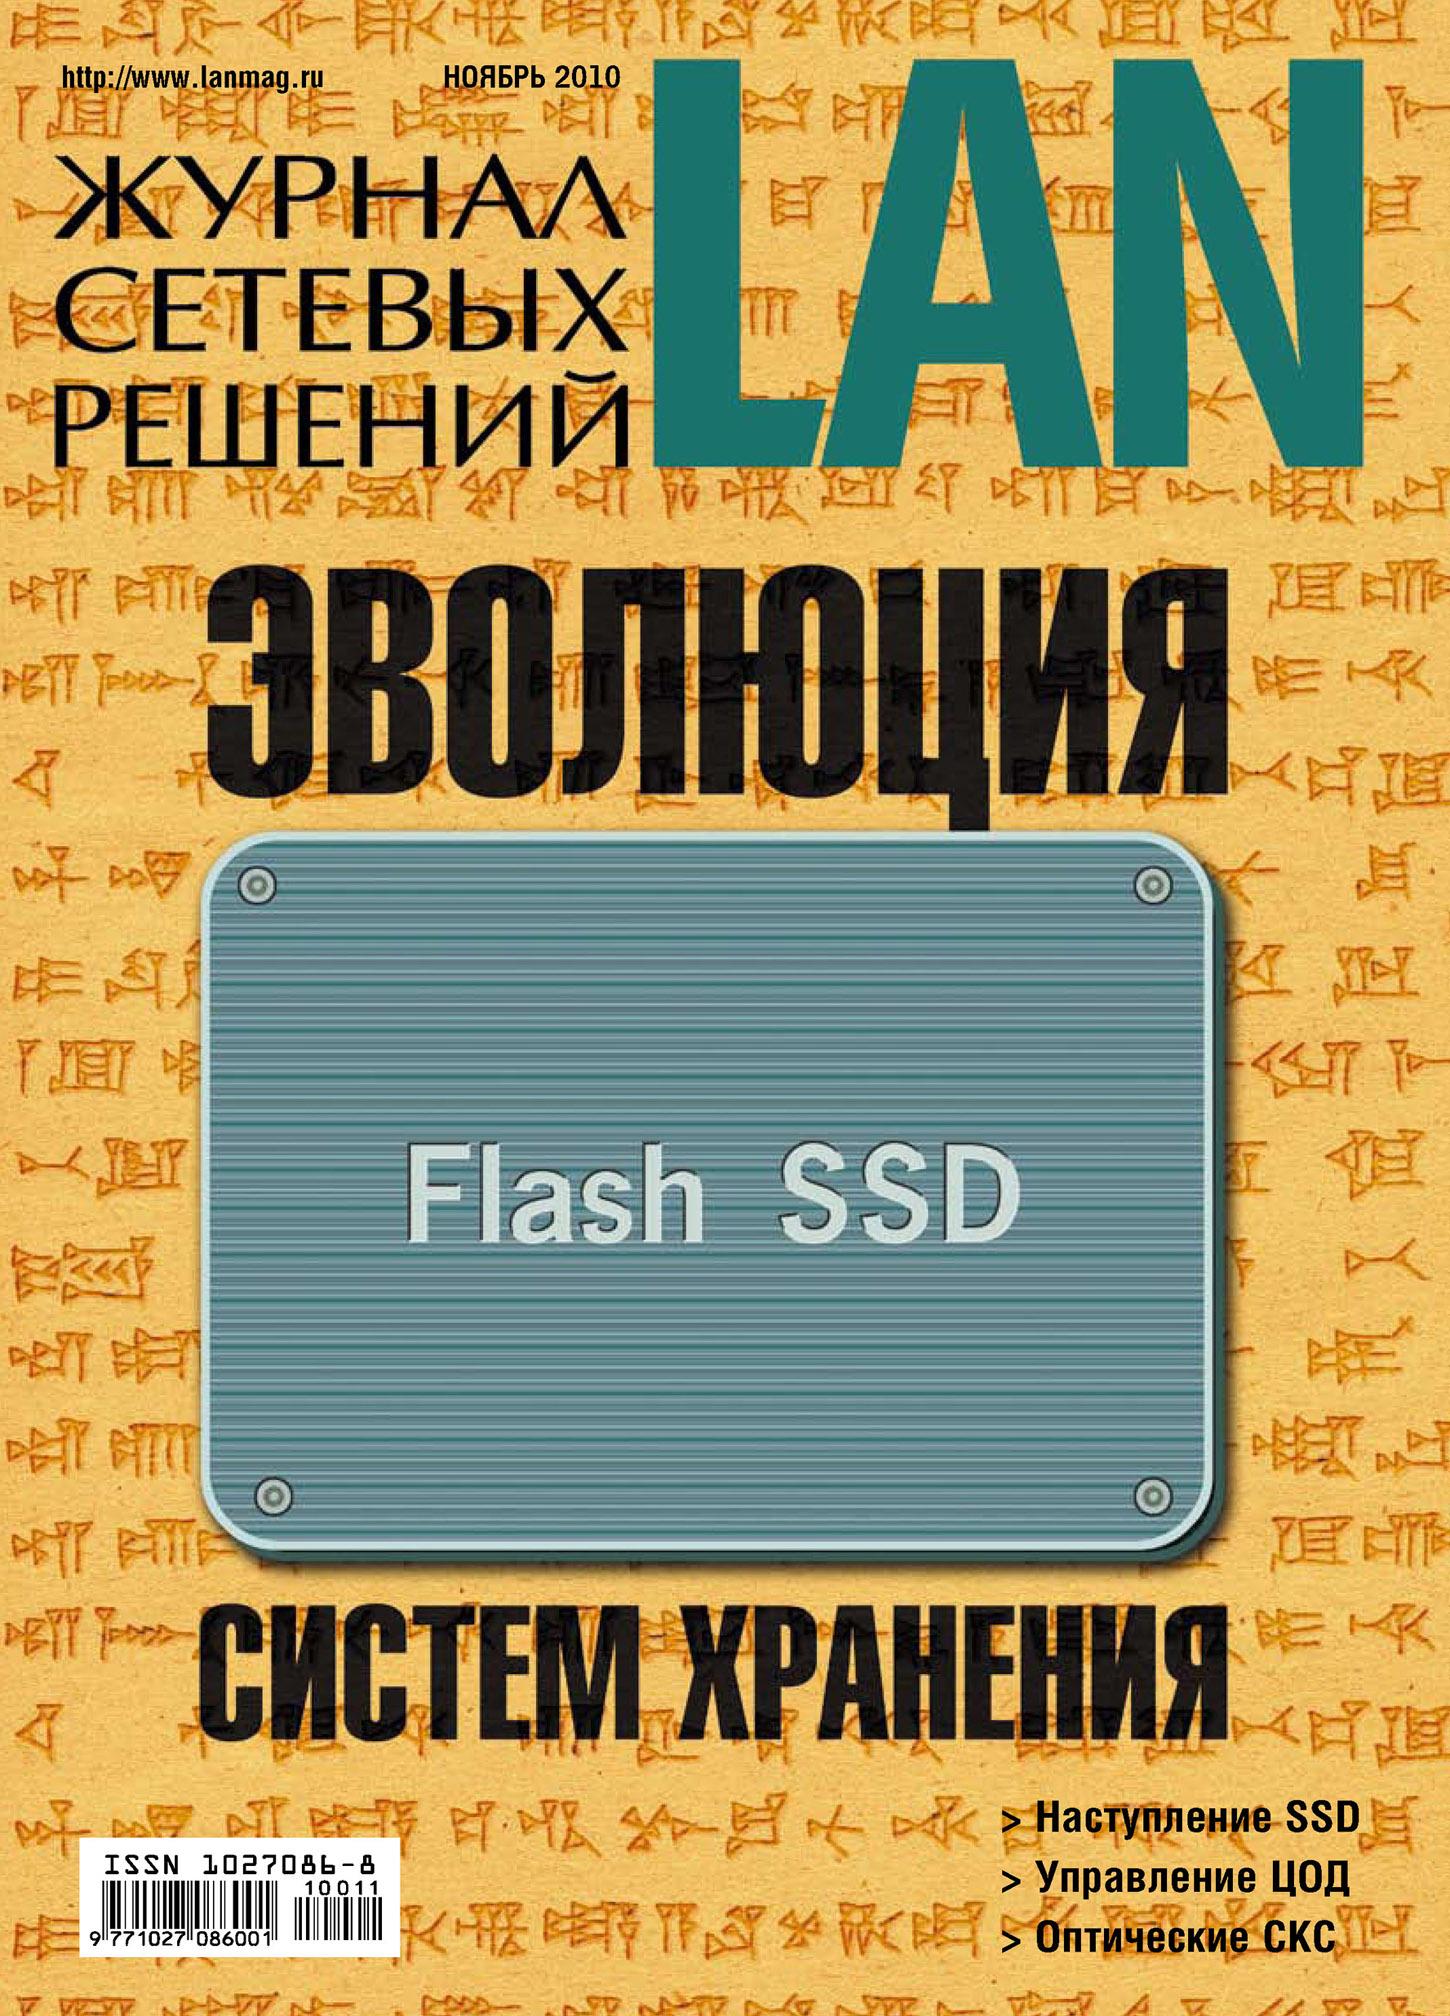 Журнал сетевых решений \/ LAN №11\/2010